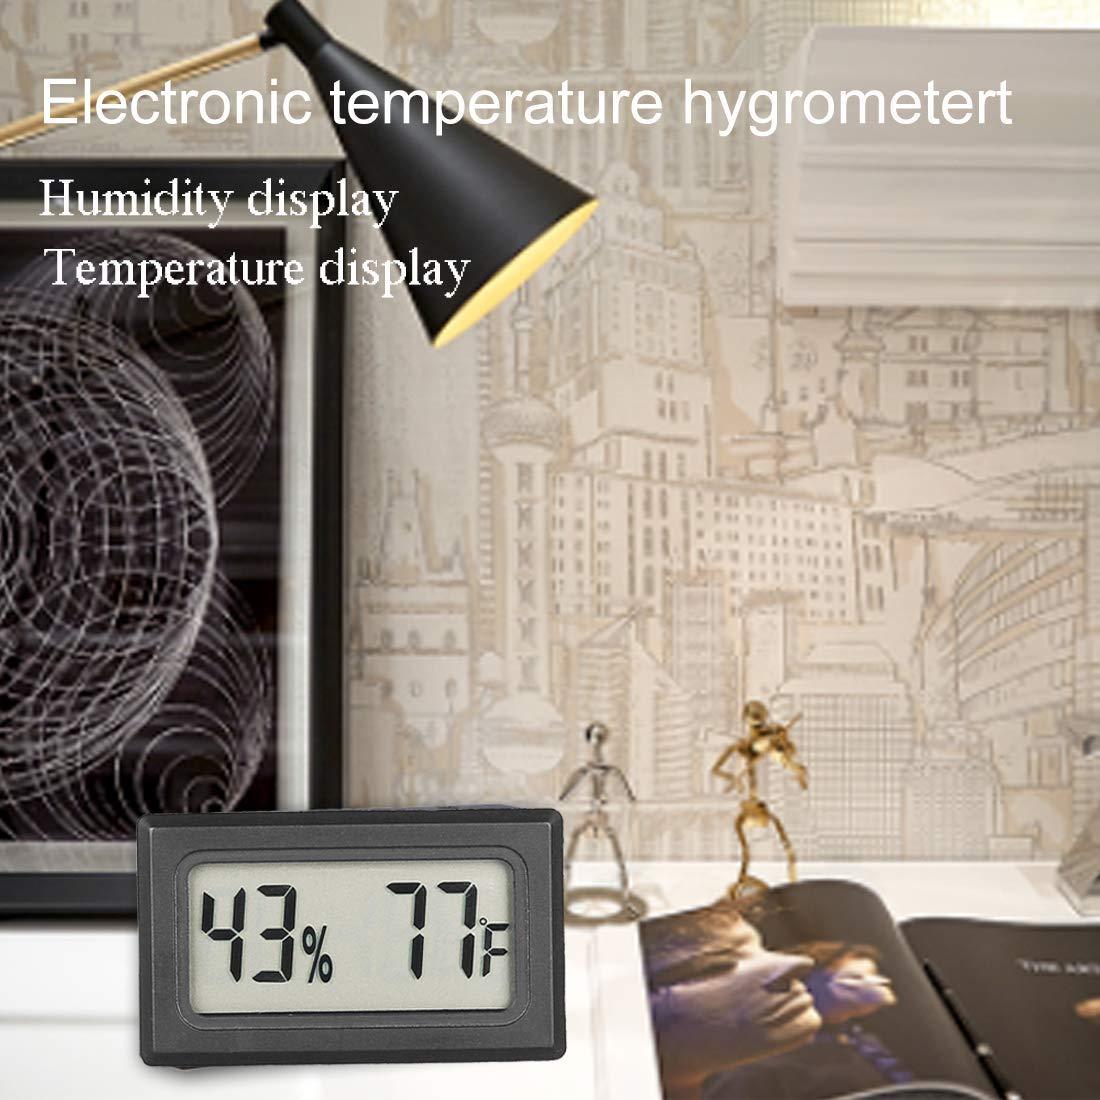 AUTIDEFY 6-Pack Mini Hygrometer Thermometer LCD Display Digital Temperature Humidity Meter Gauge for Incubators Reptile and Humidors Fahrenheit (℉)